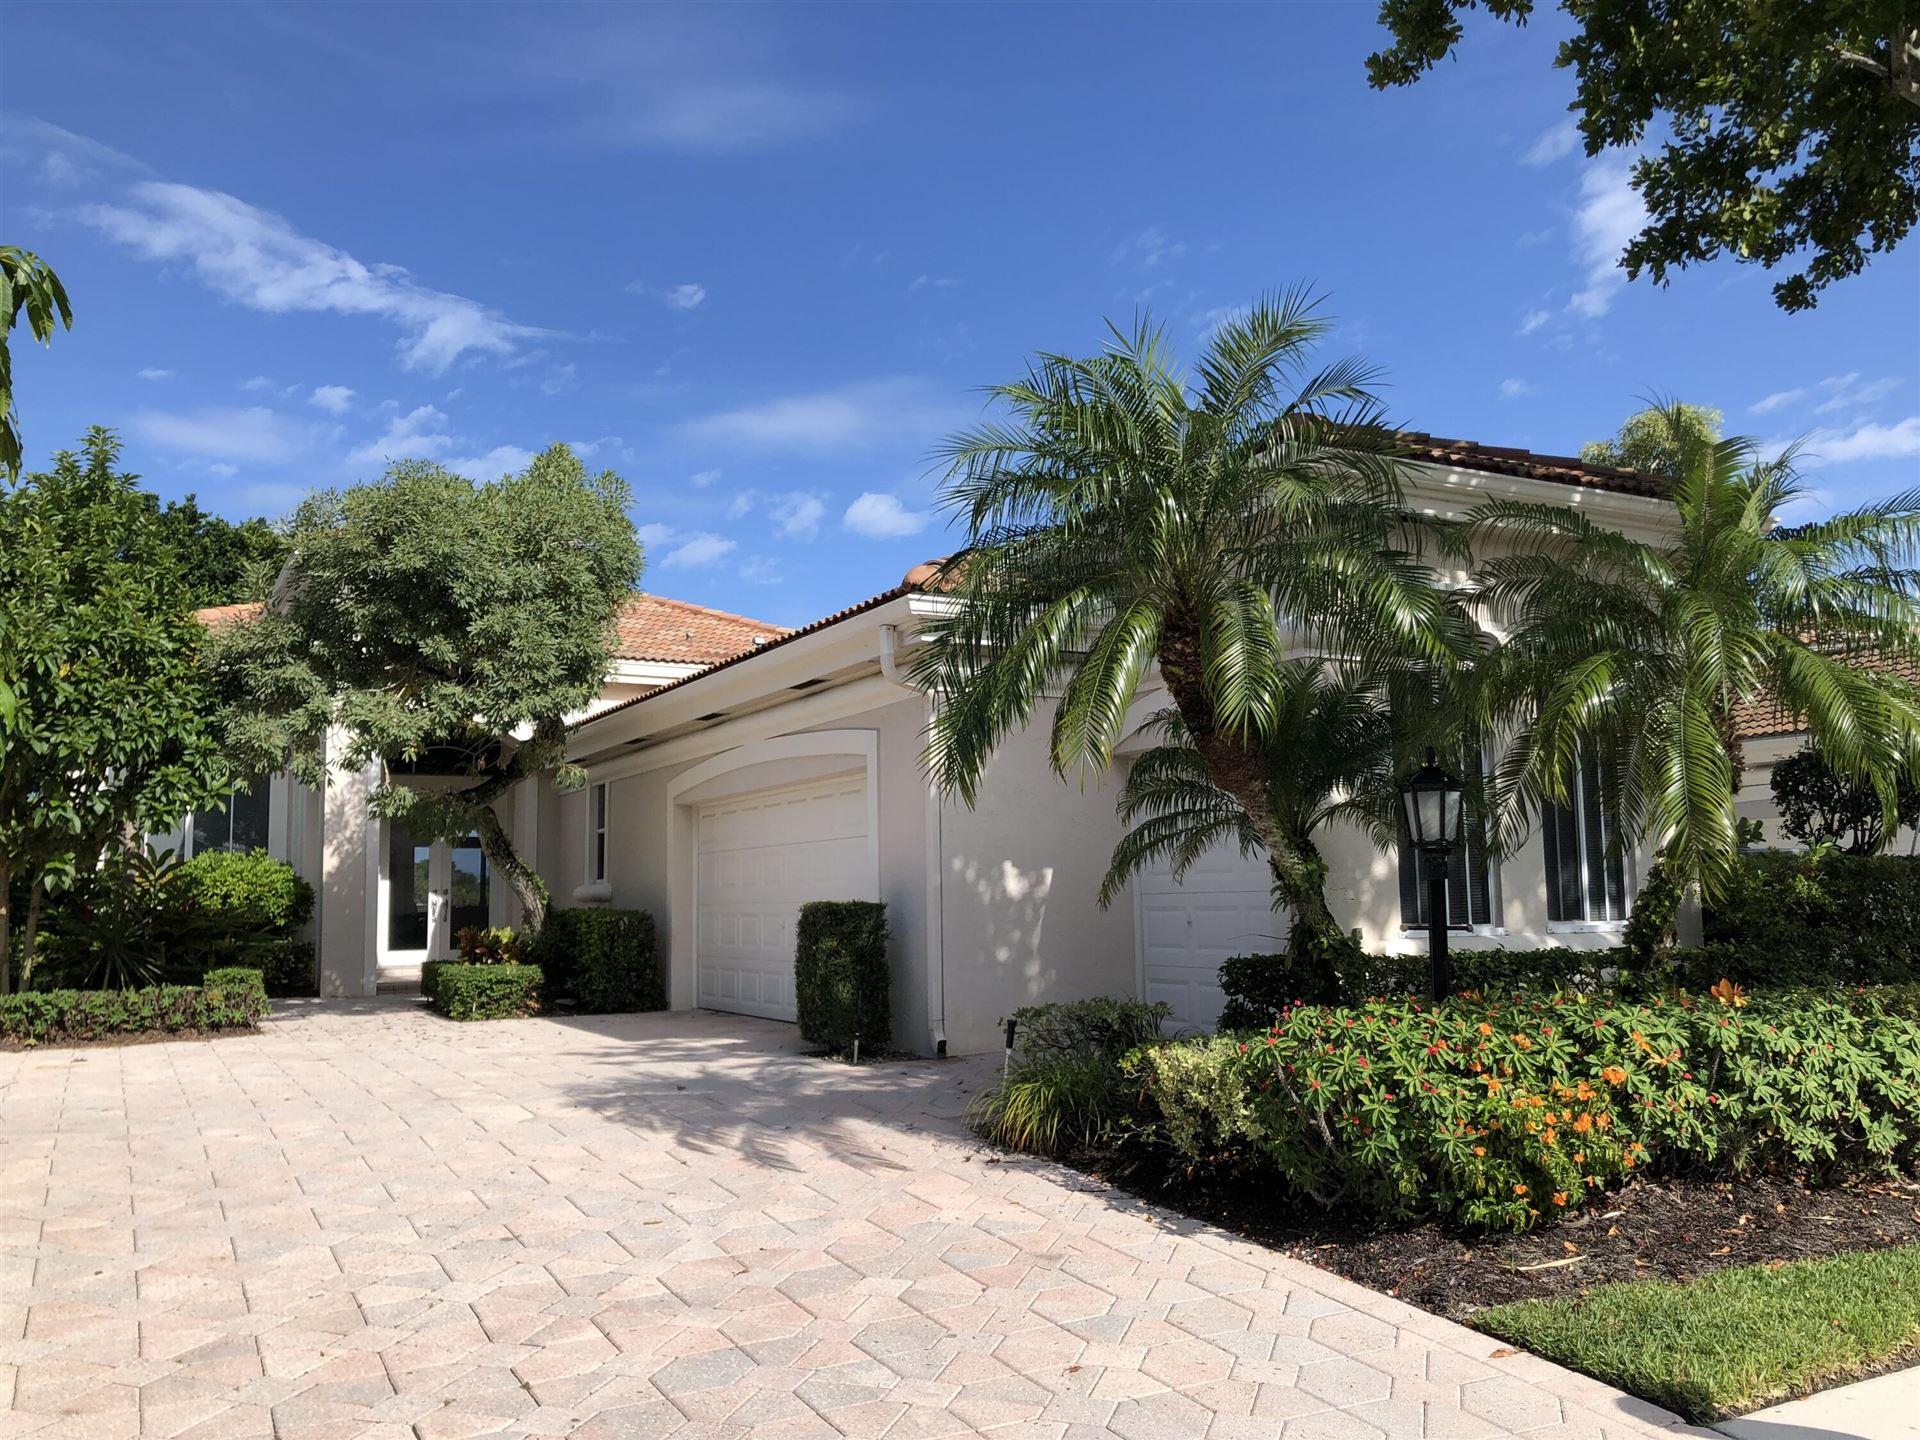 Photo for 265 Isle Way, Palm Beach Gardens, FL 33418 (MLS # RX-10751144)